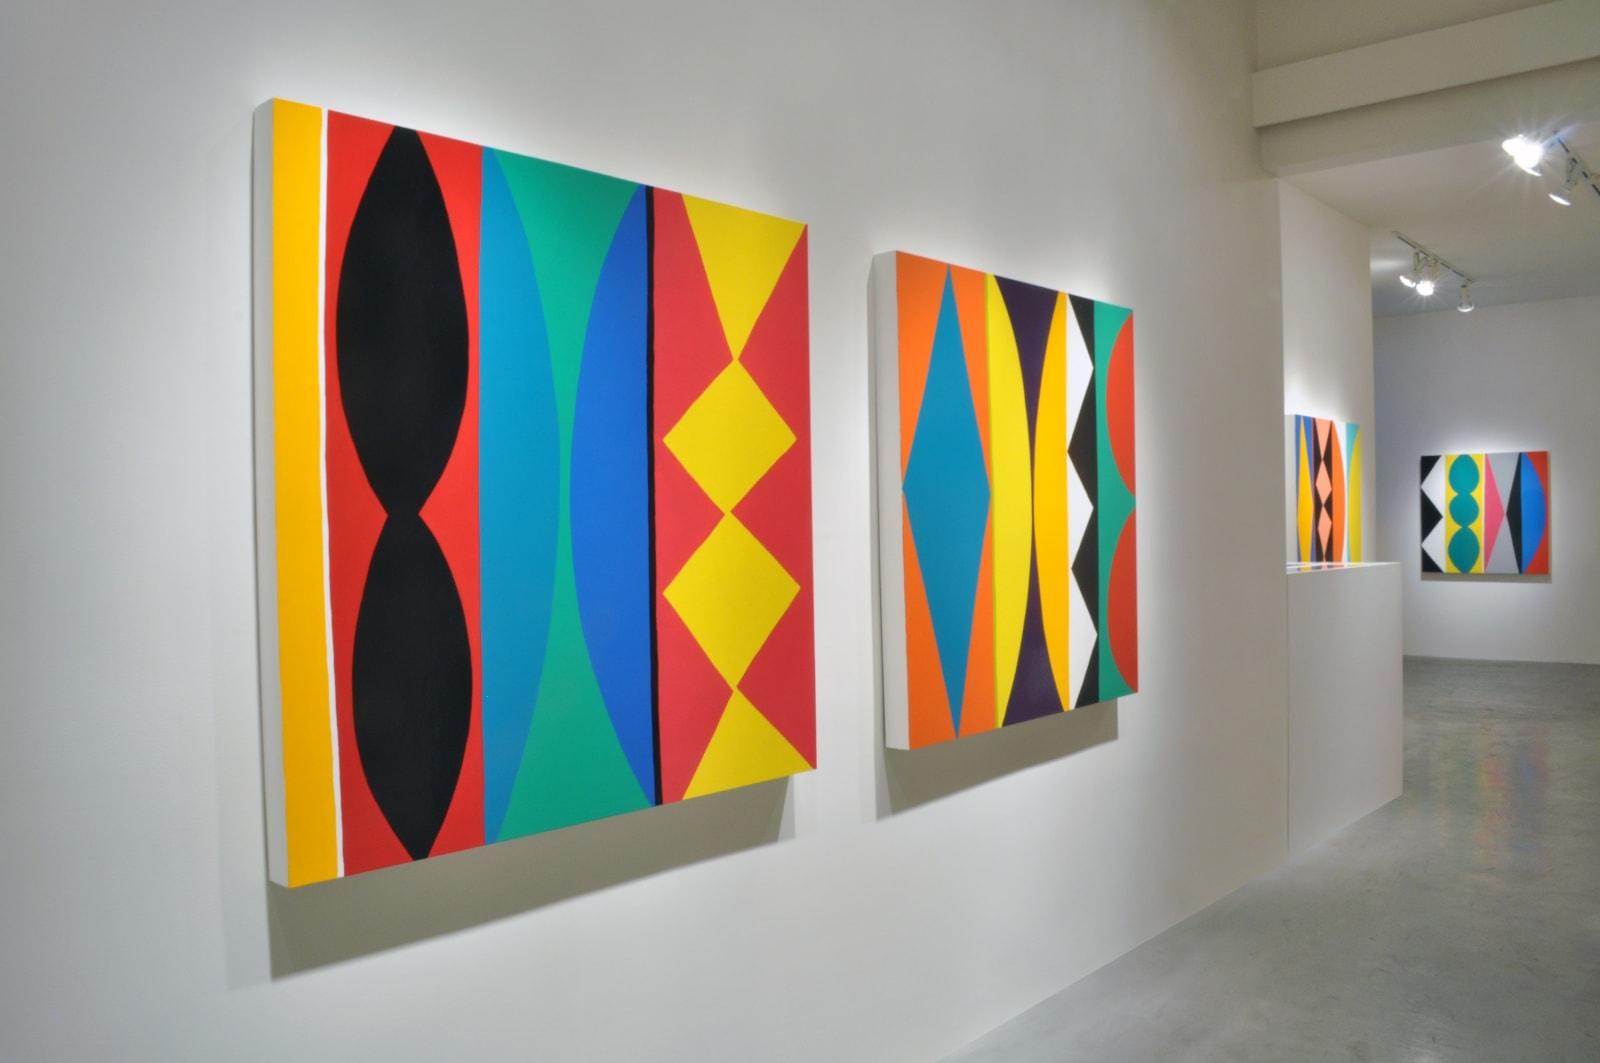 At Quint Contemporary Art